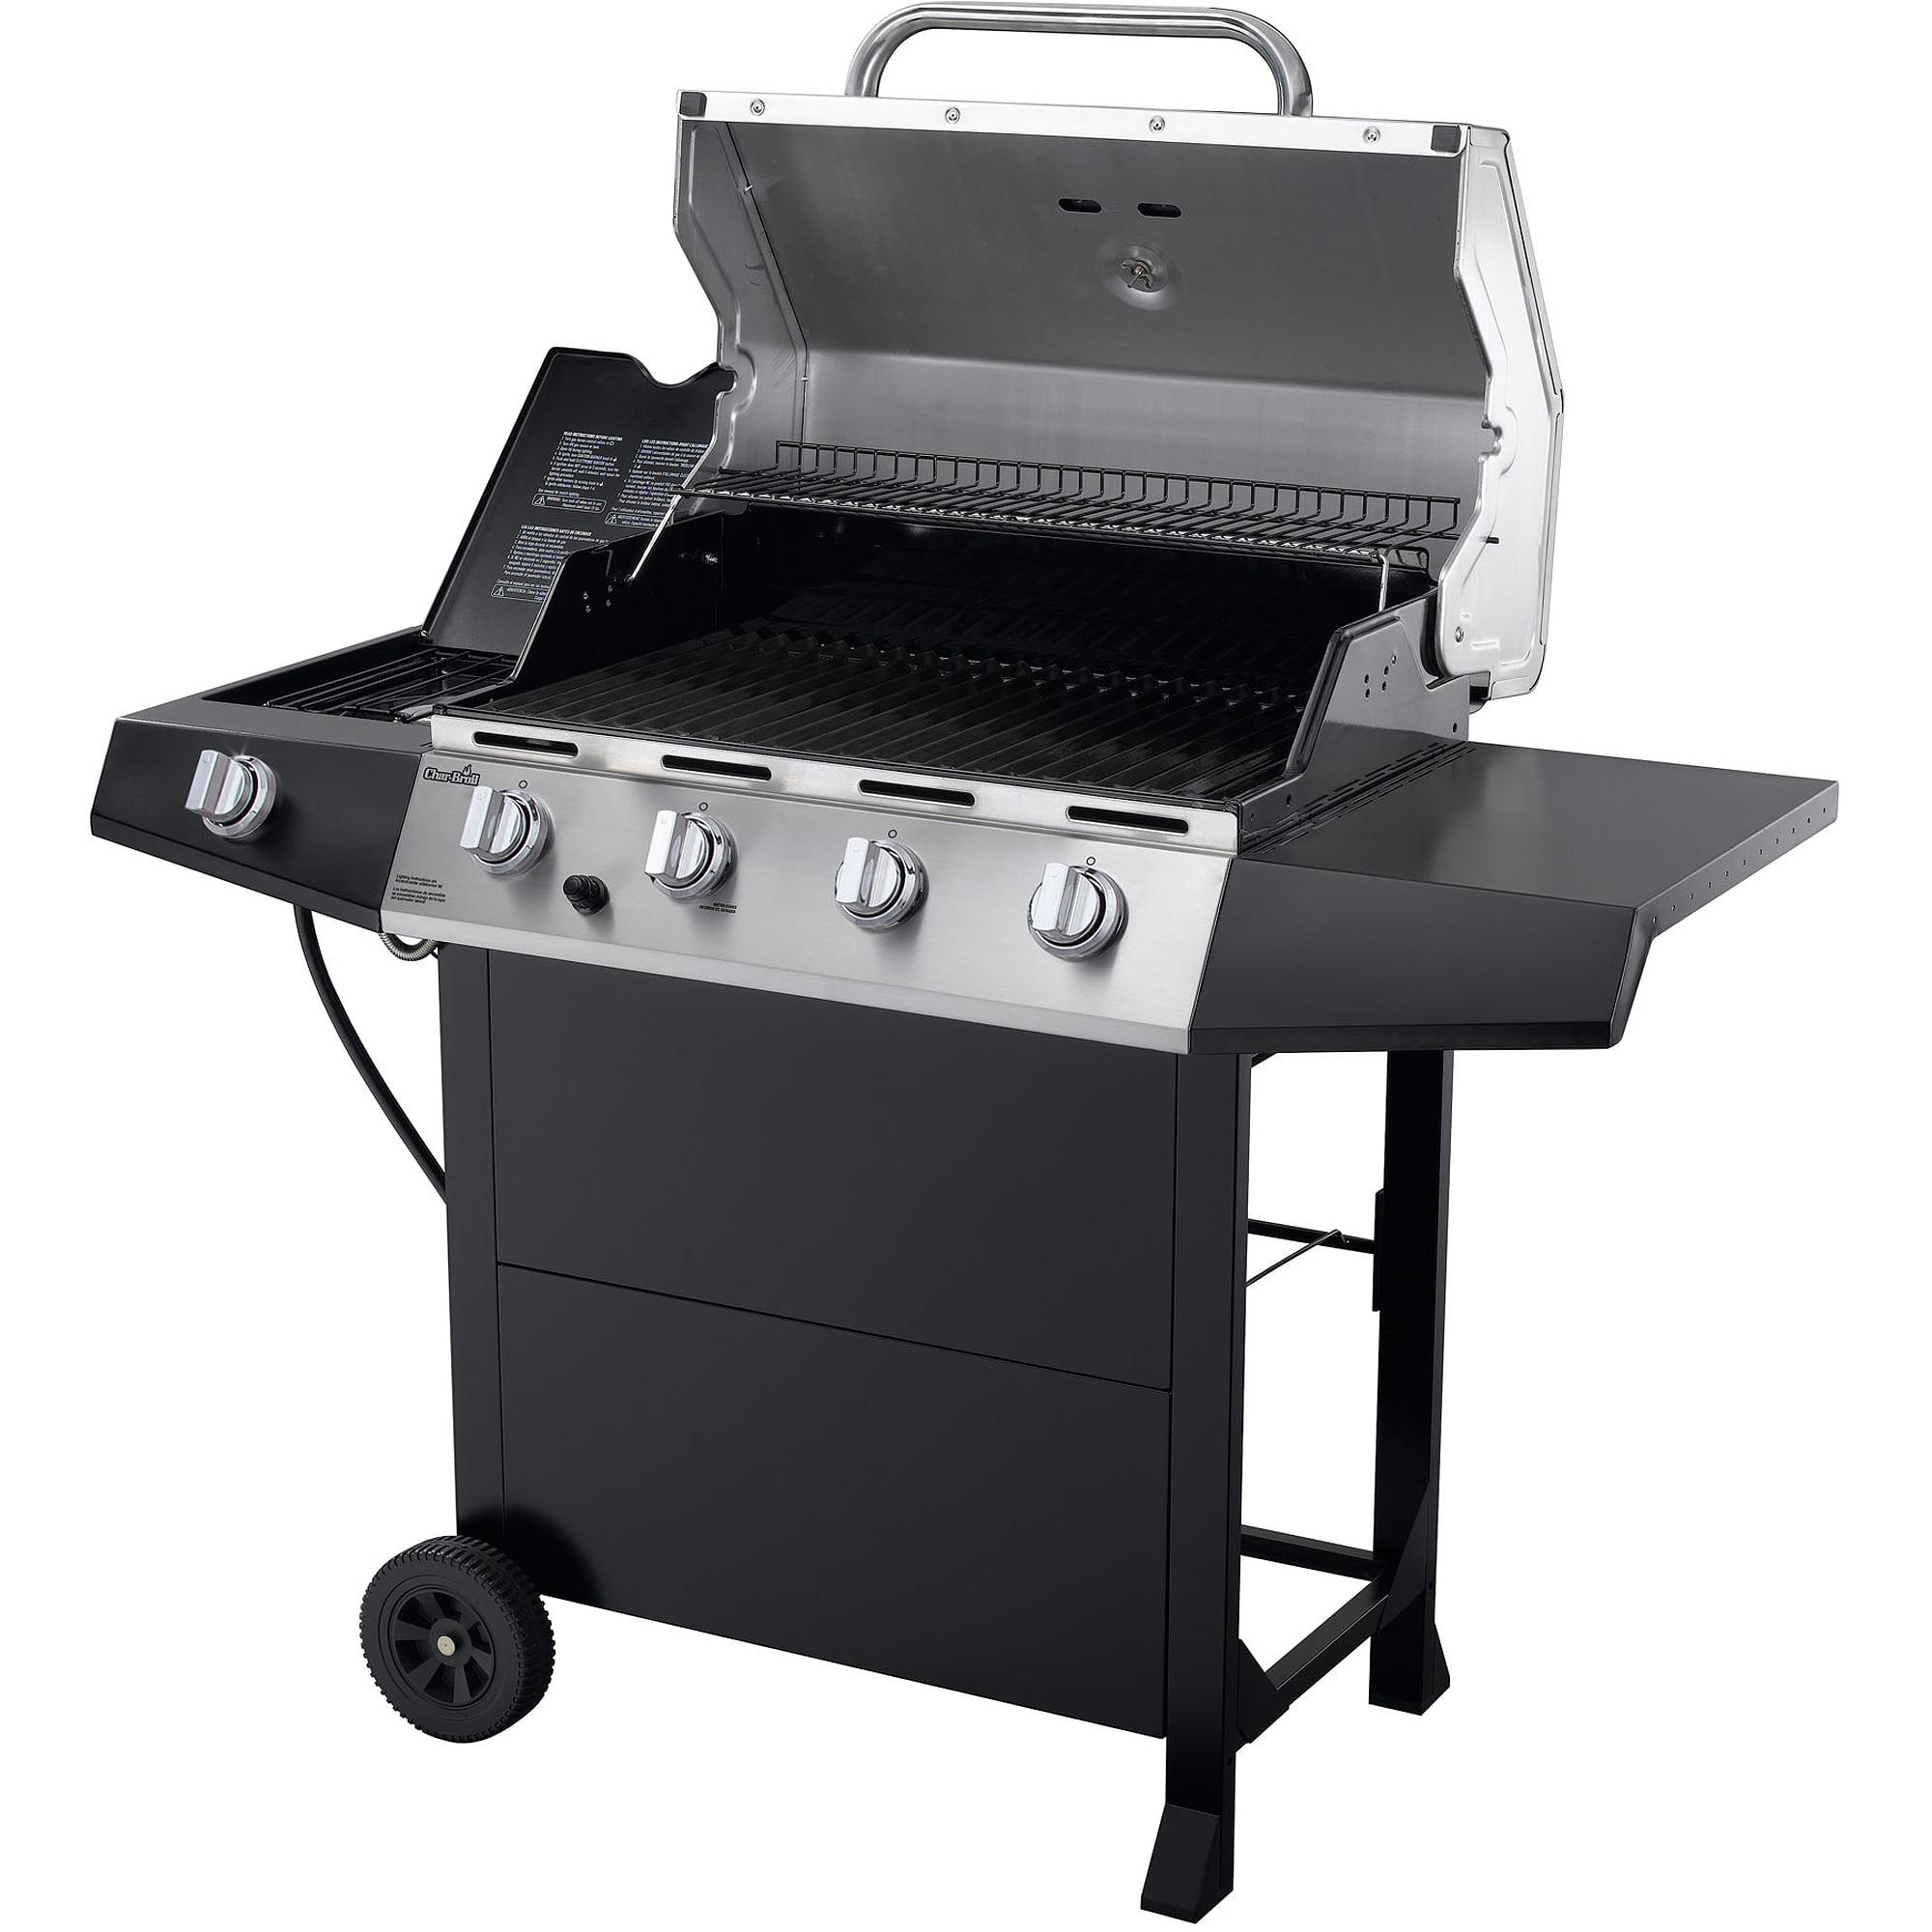 Char Broil 4 Burner Gas Grill Stainless Steel Black Walmart